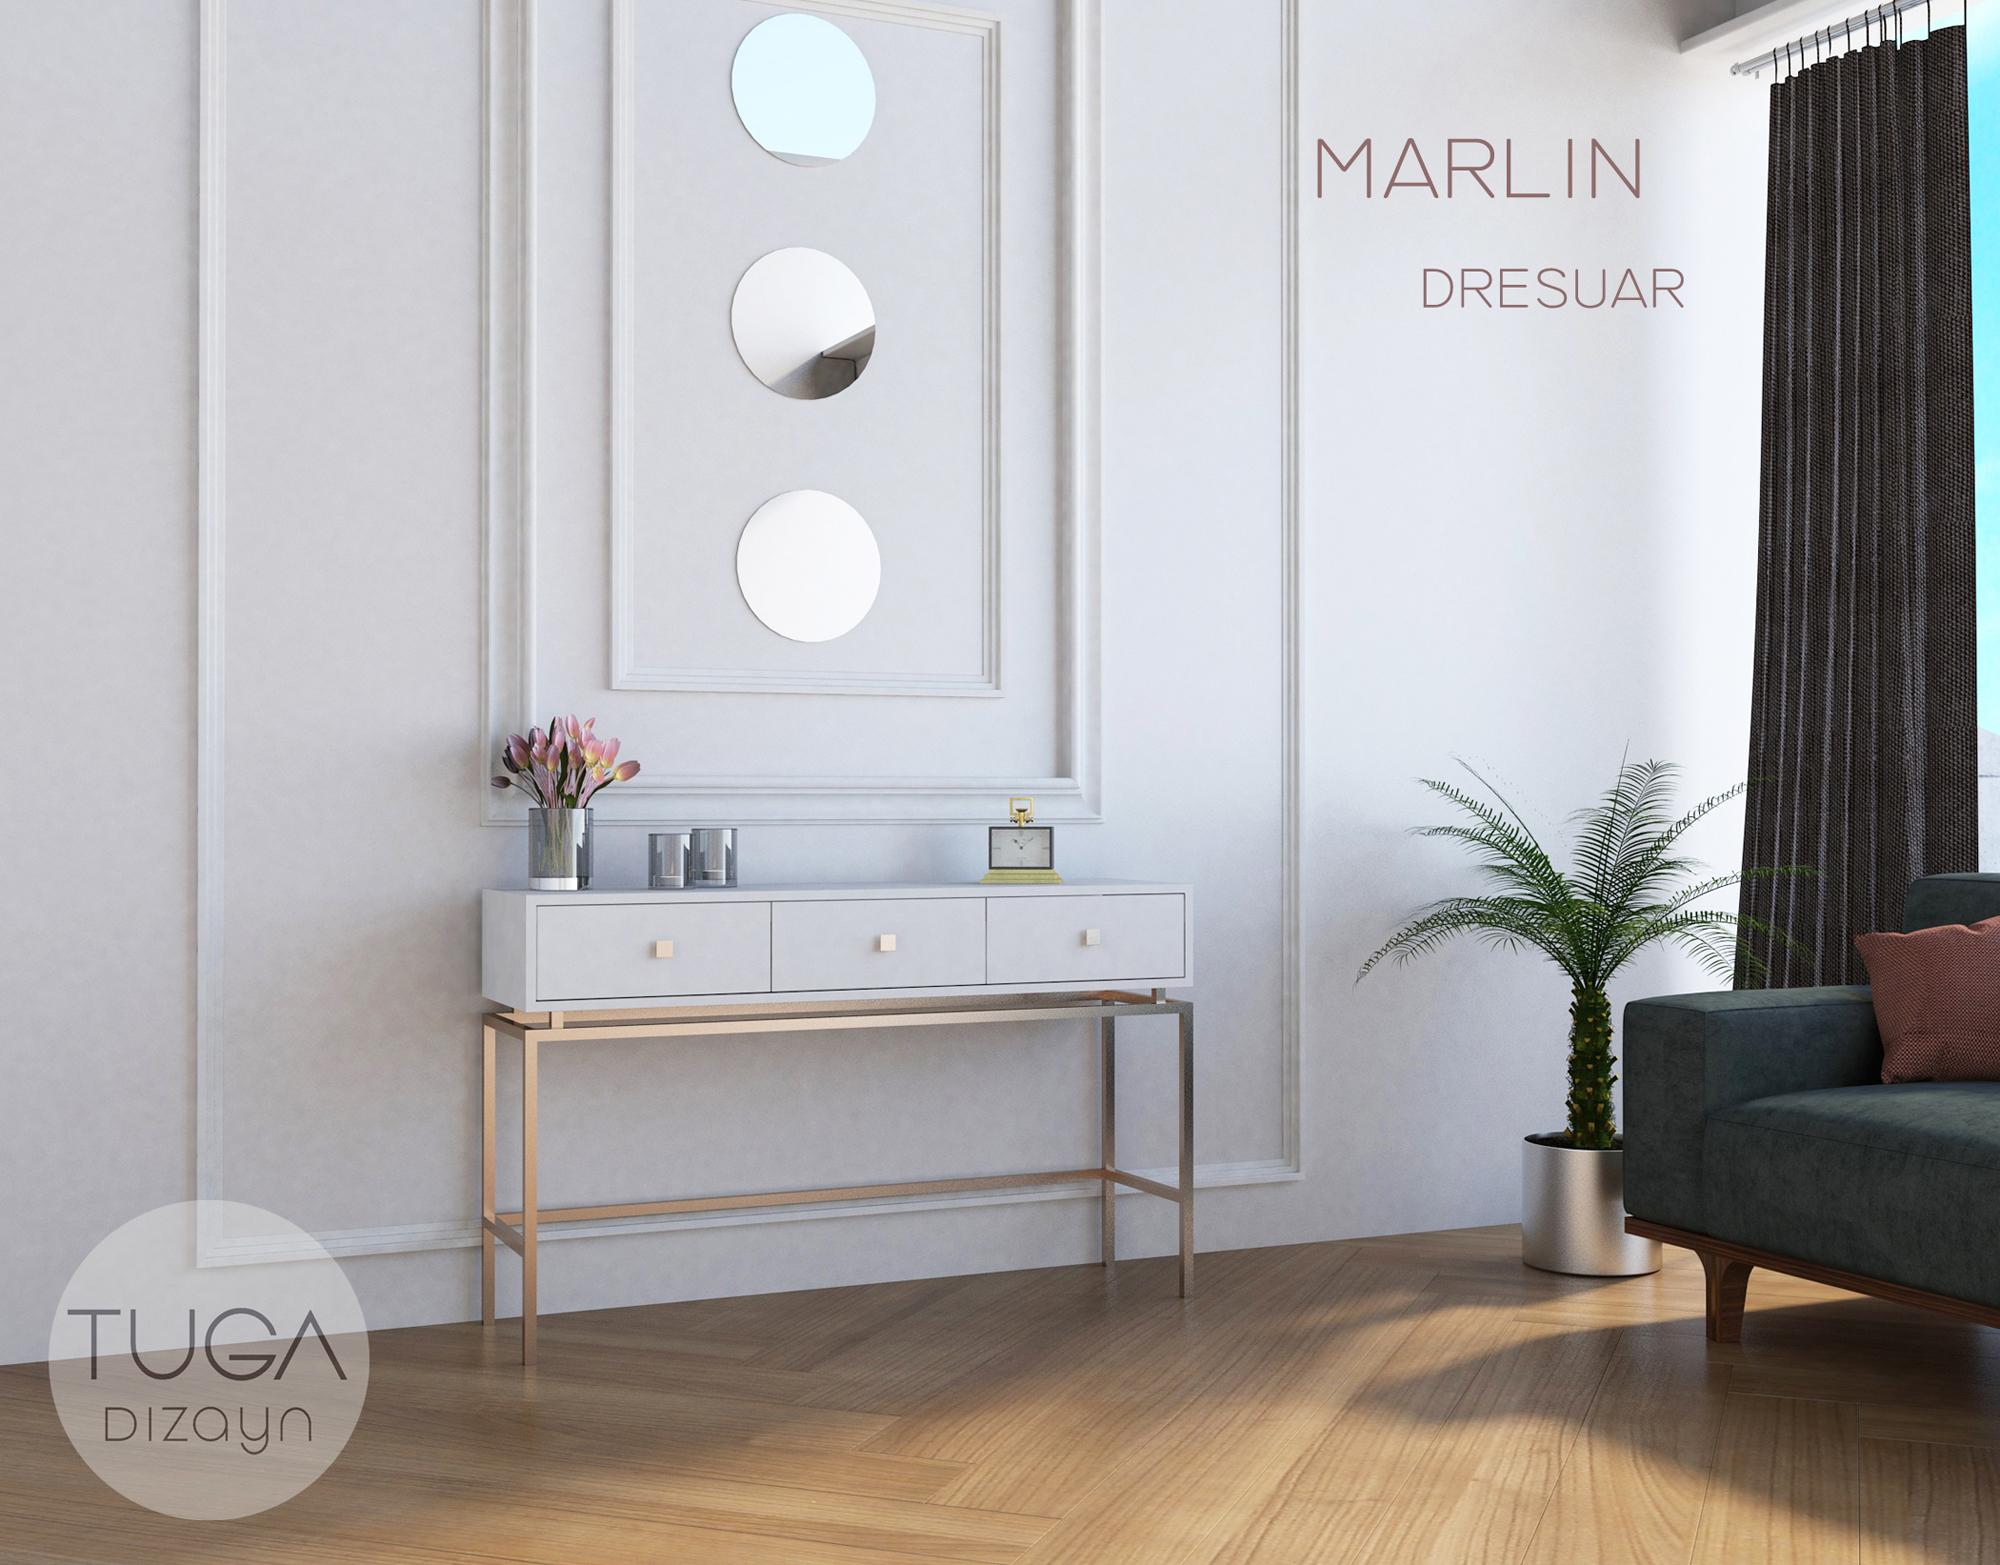 Marlin Dresuar